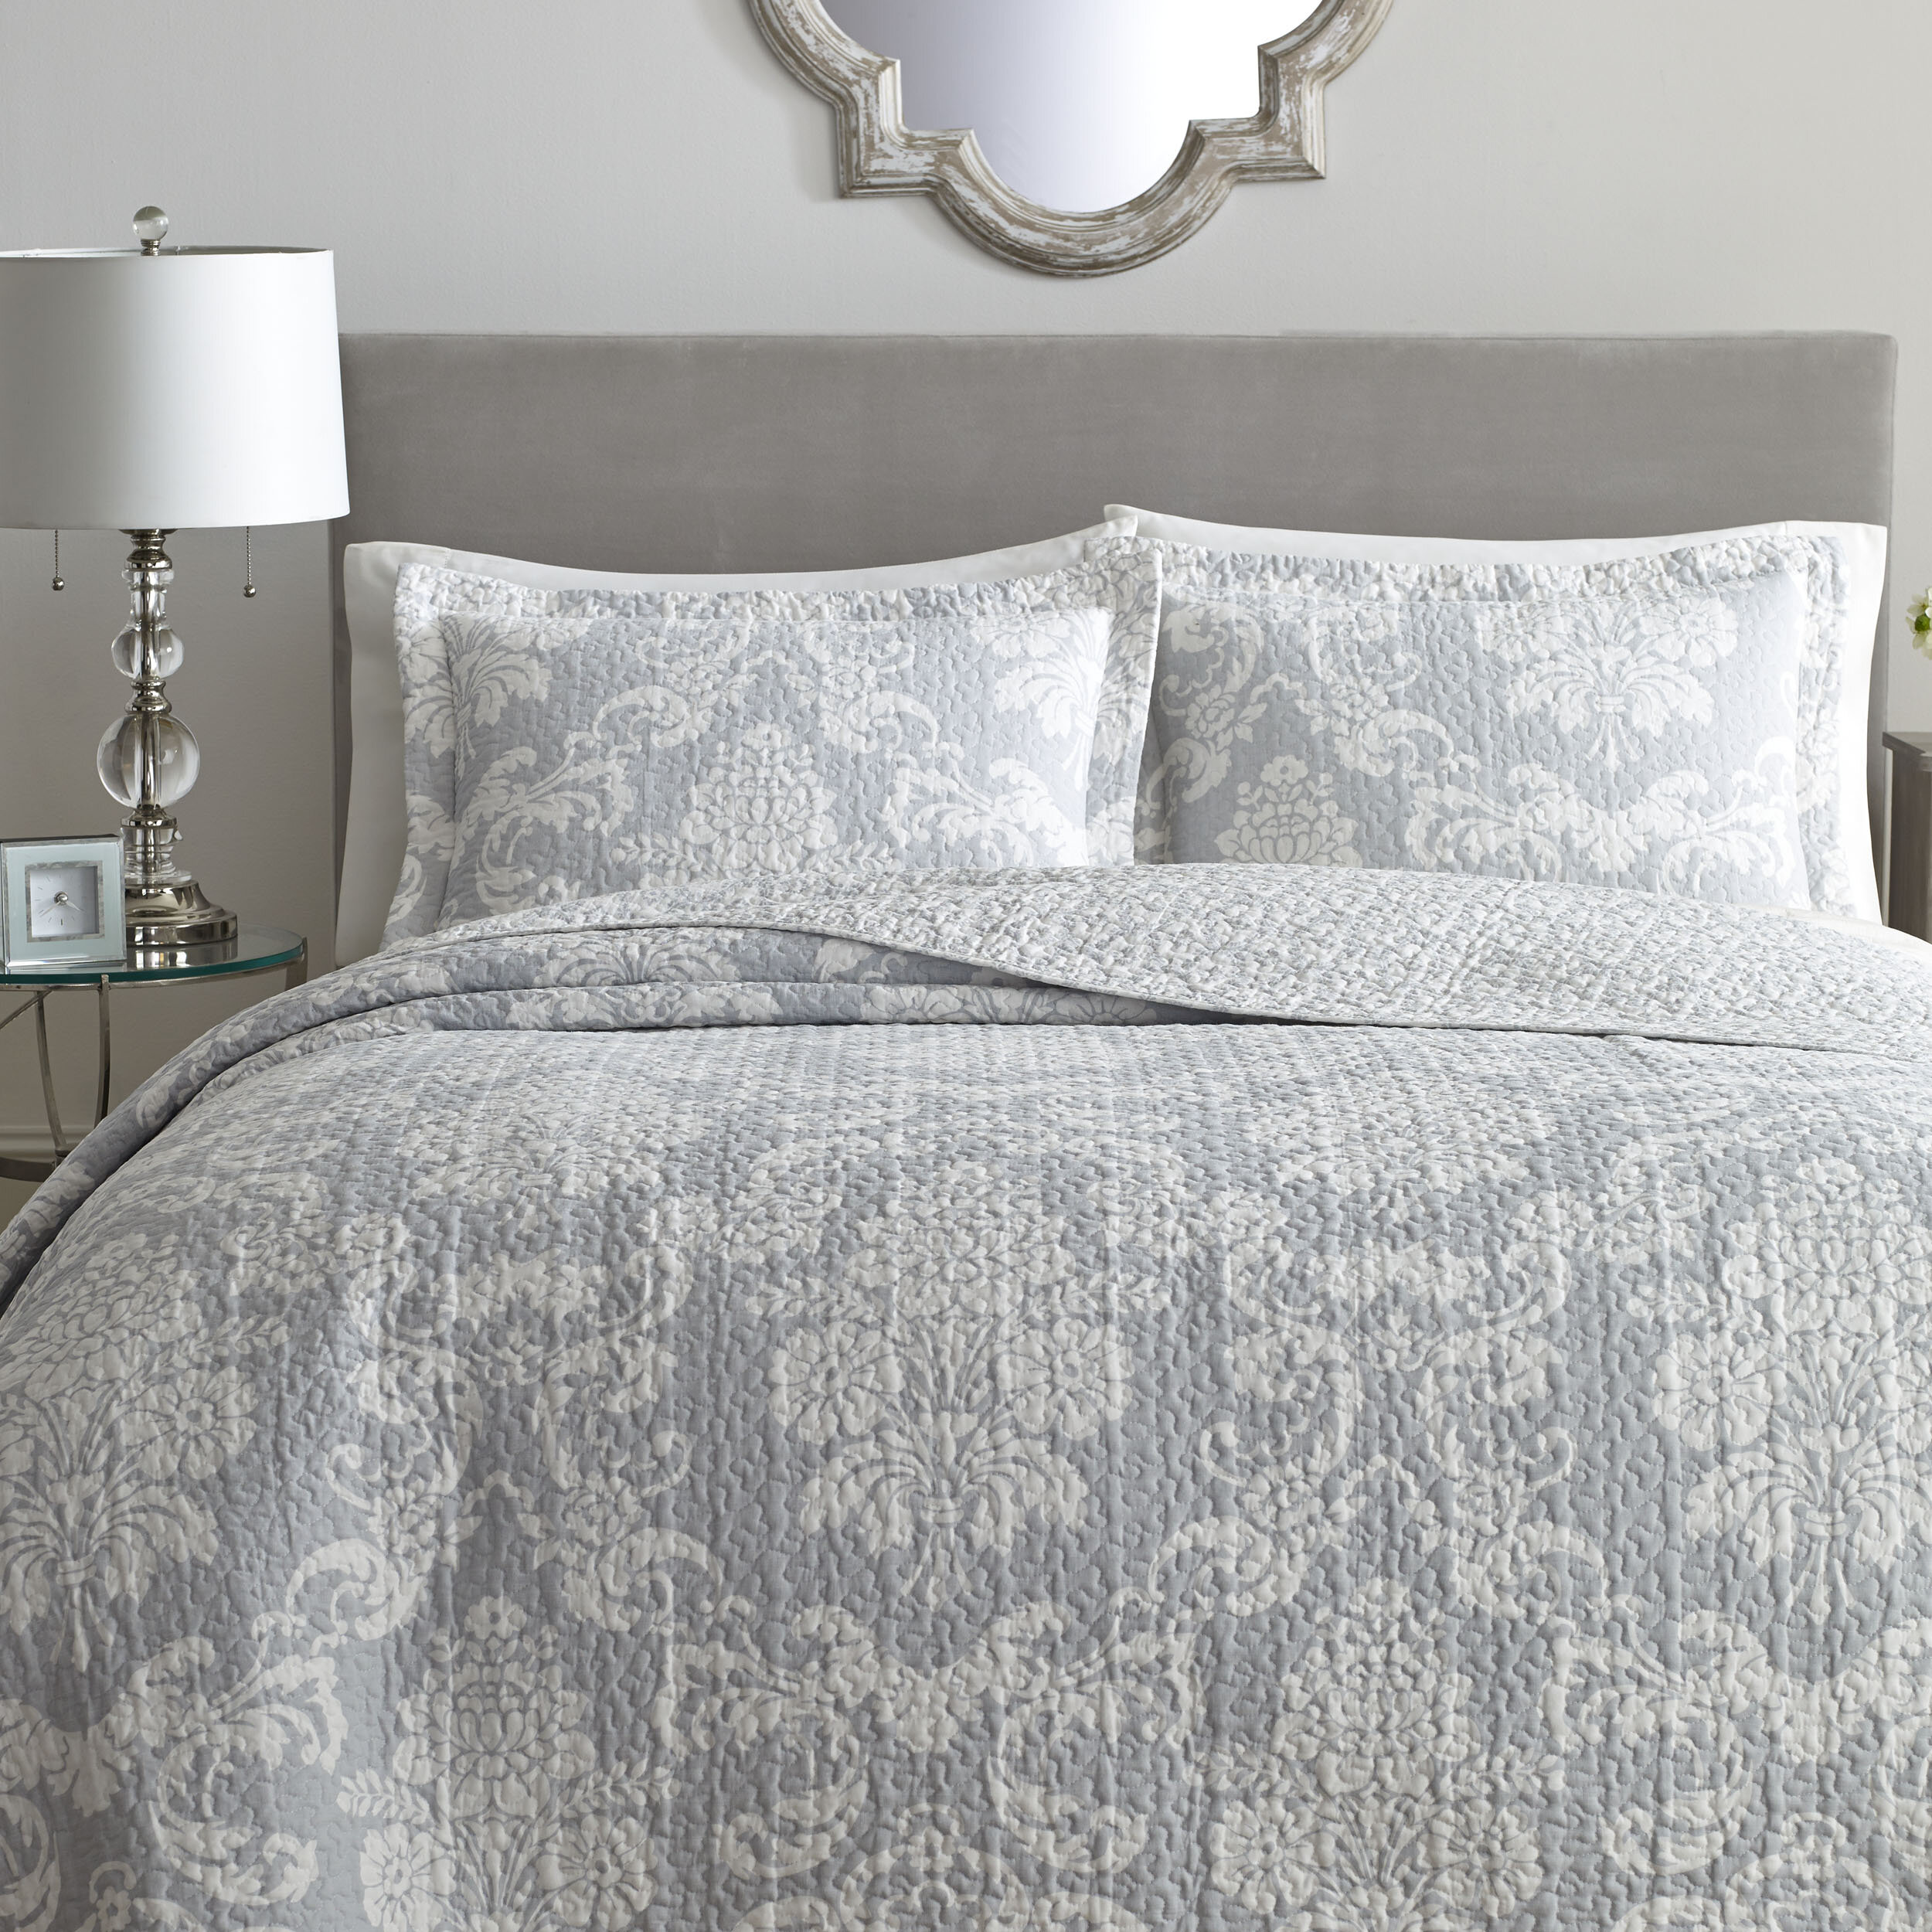 Laura Ashley Venetia 100% Cotton Reversible Quilt Set By Laura Ashley Home  U0026 Reviews | Wayfair